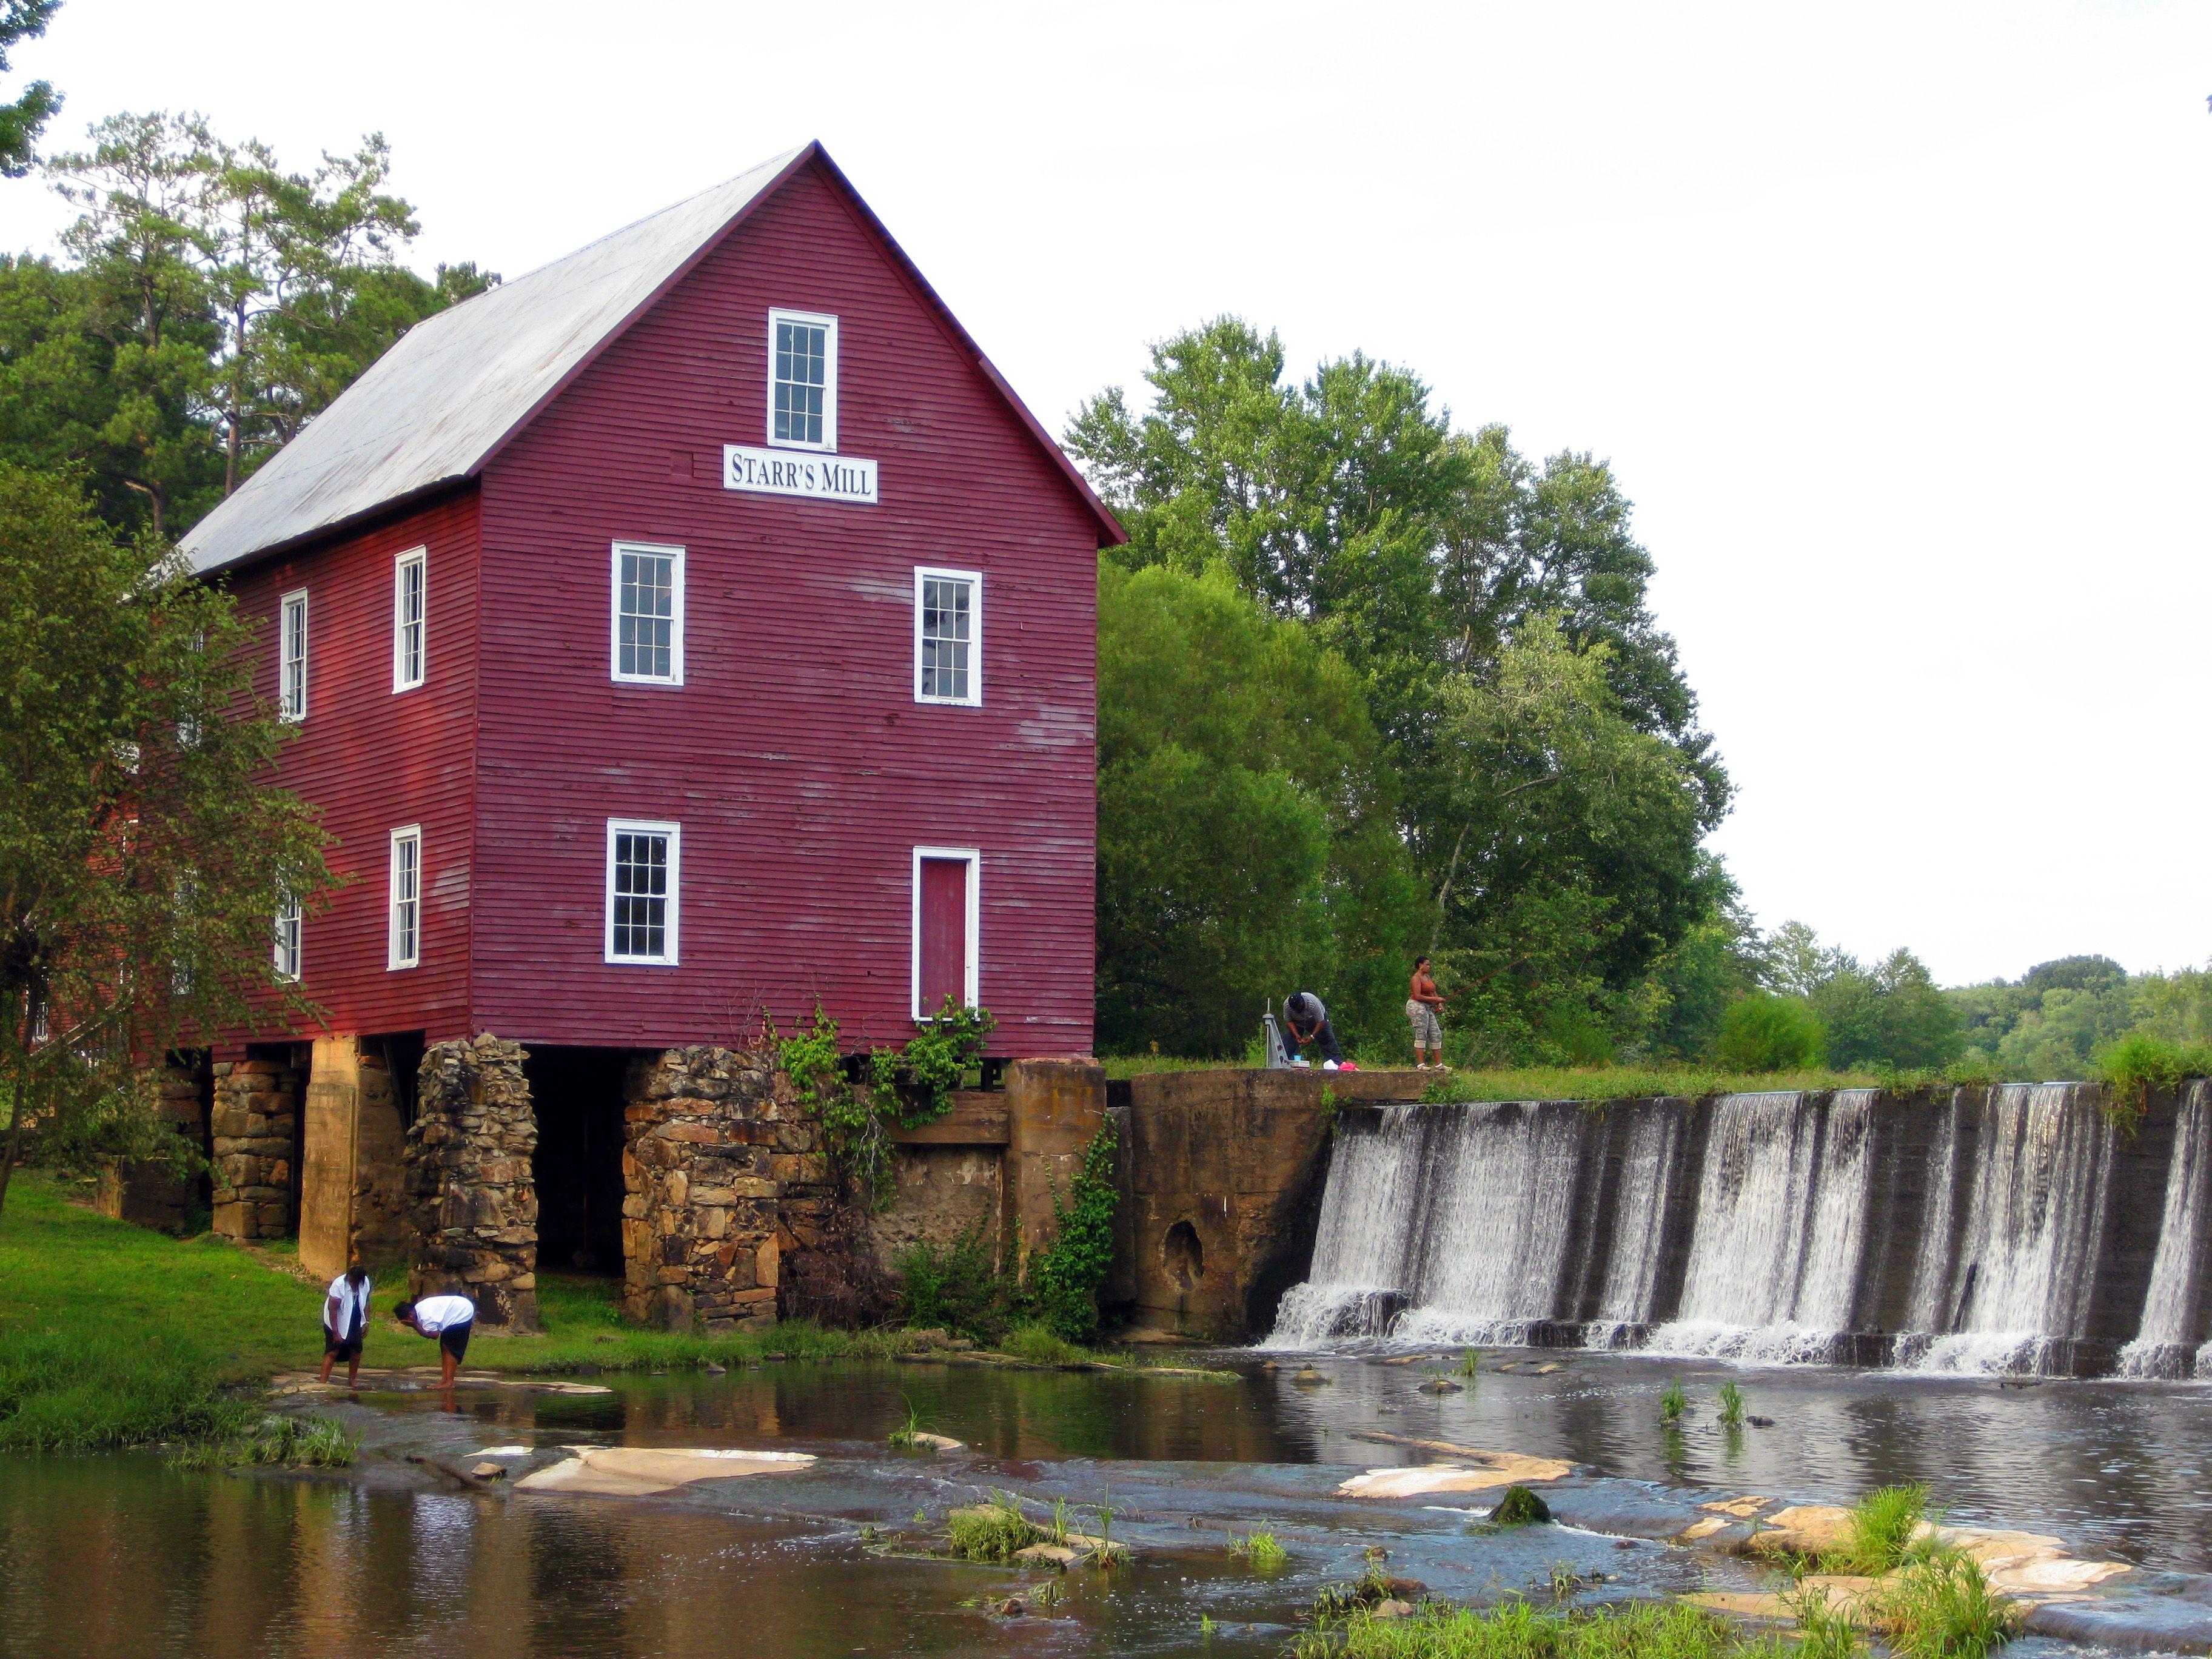 Starr's Mill Senoia, Peachy